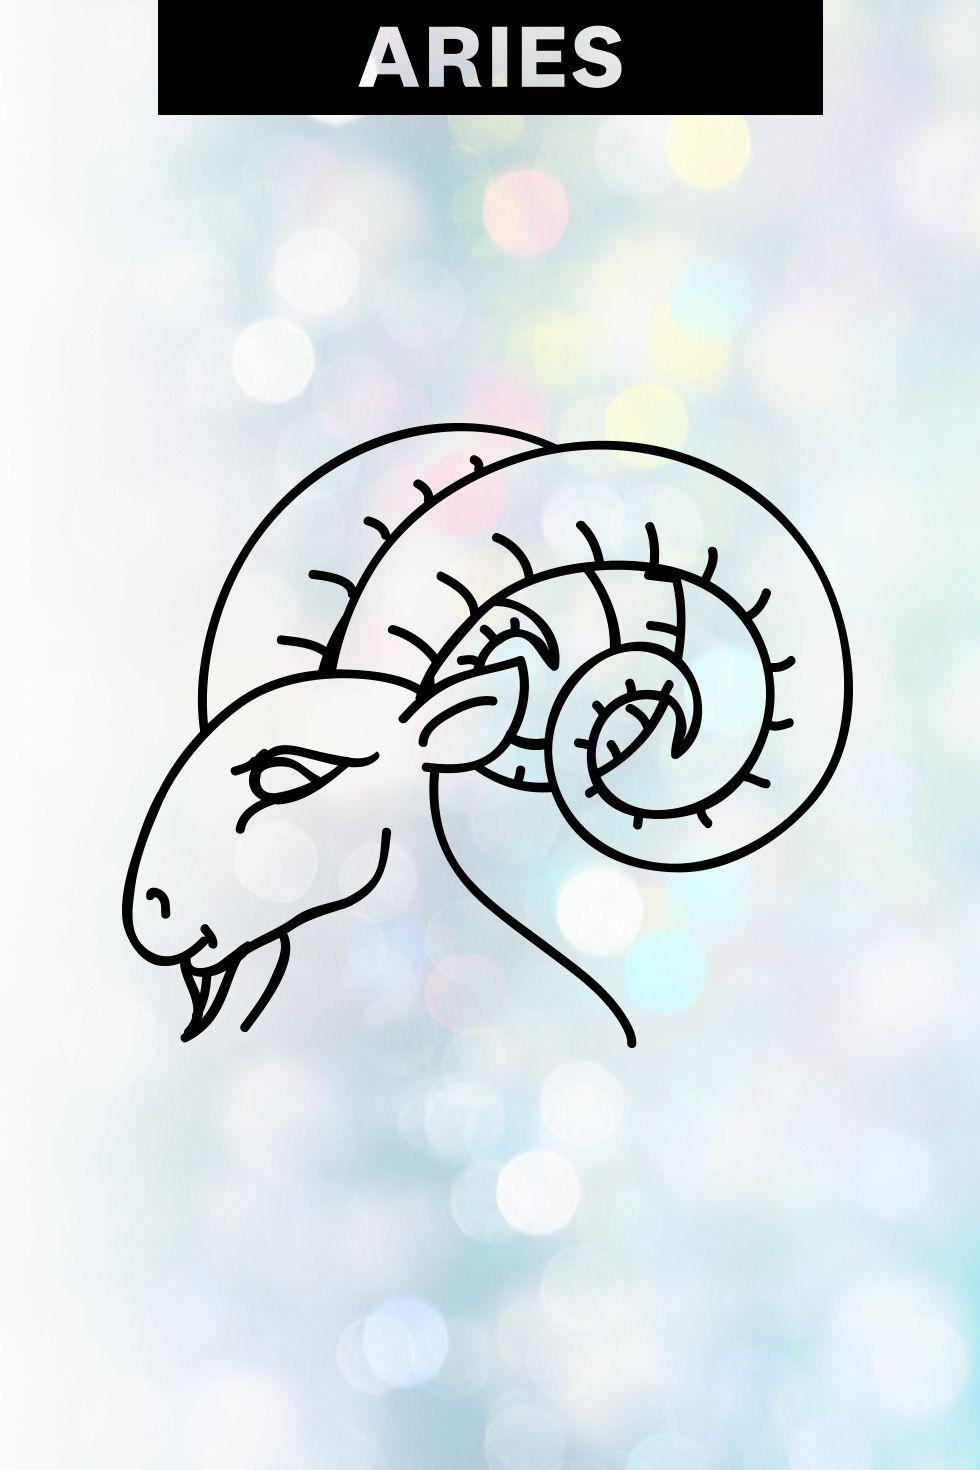 Aries zodiac horoscope symbol